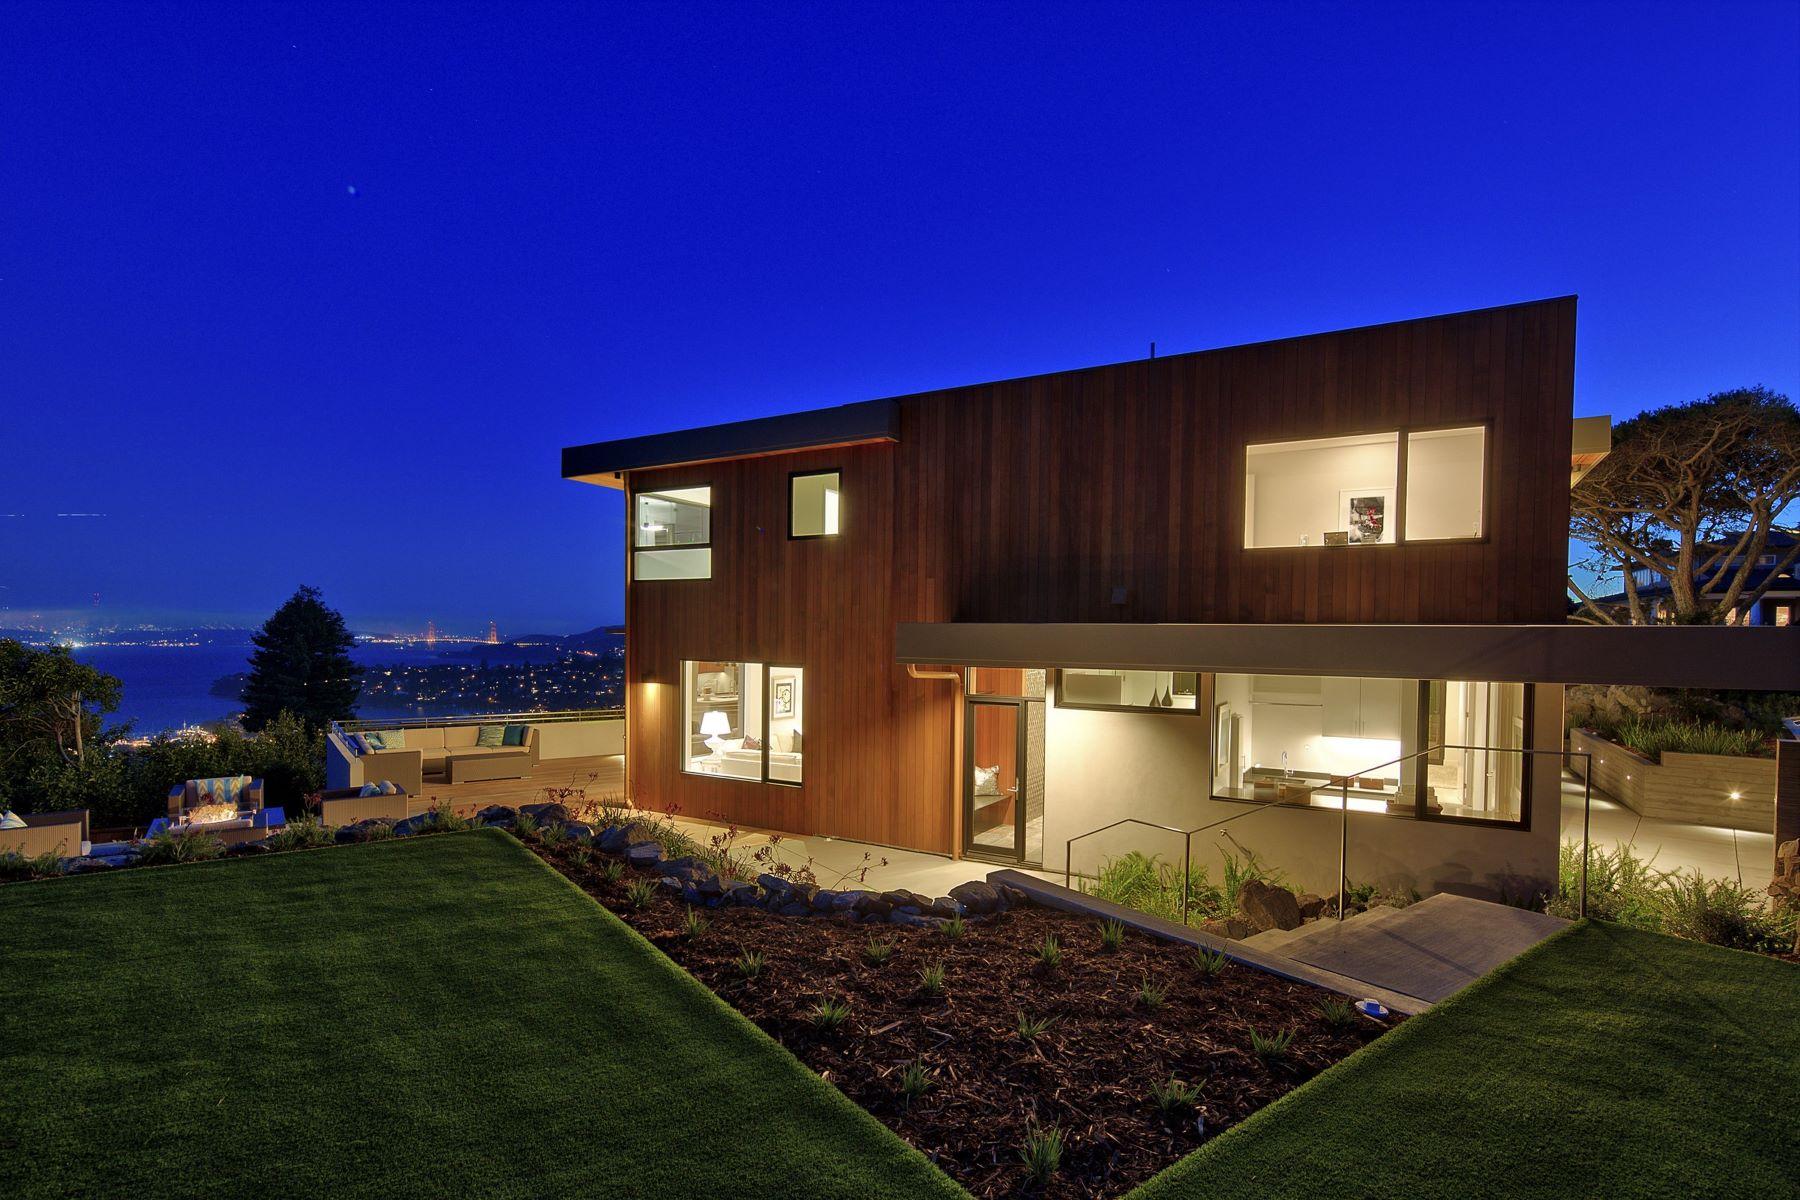 واحد منزل الأسرة للـ Sale في Spectacular Ultra Contemporary Home 86 Sugarloaf Dr Tiburon, California 94920 United States